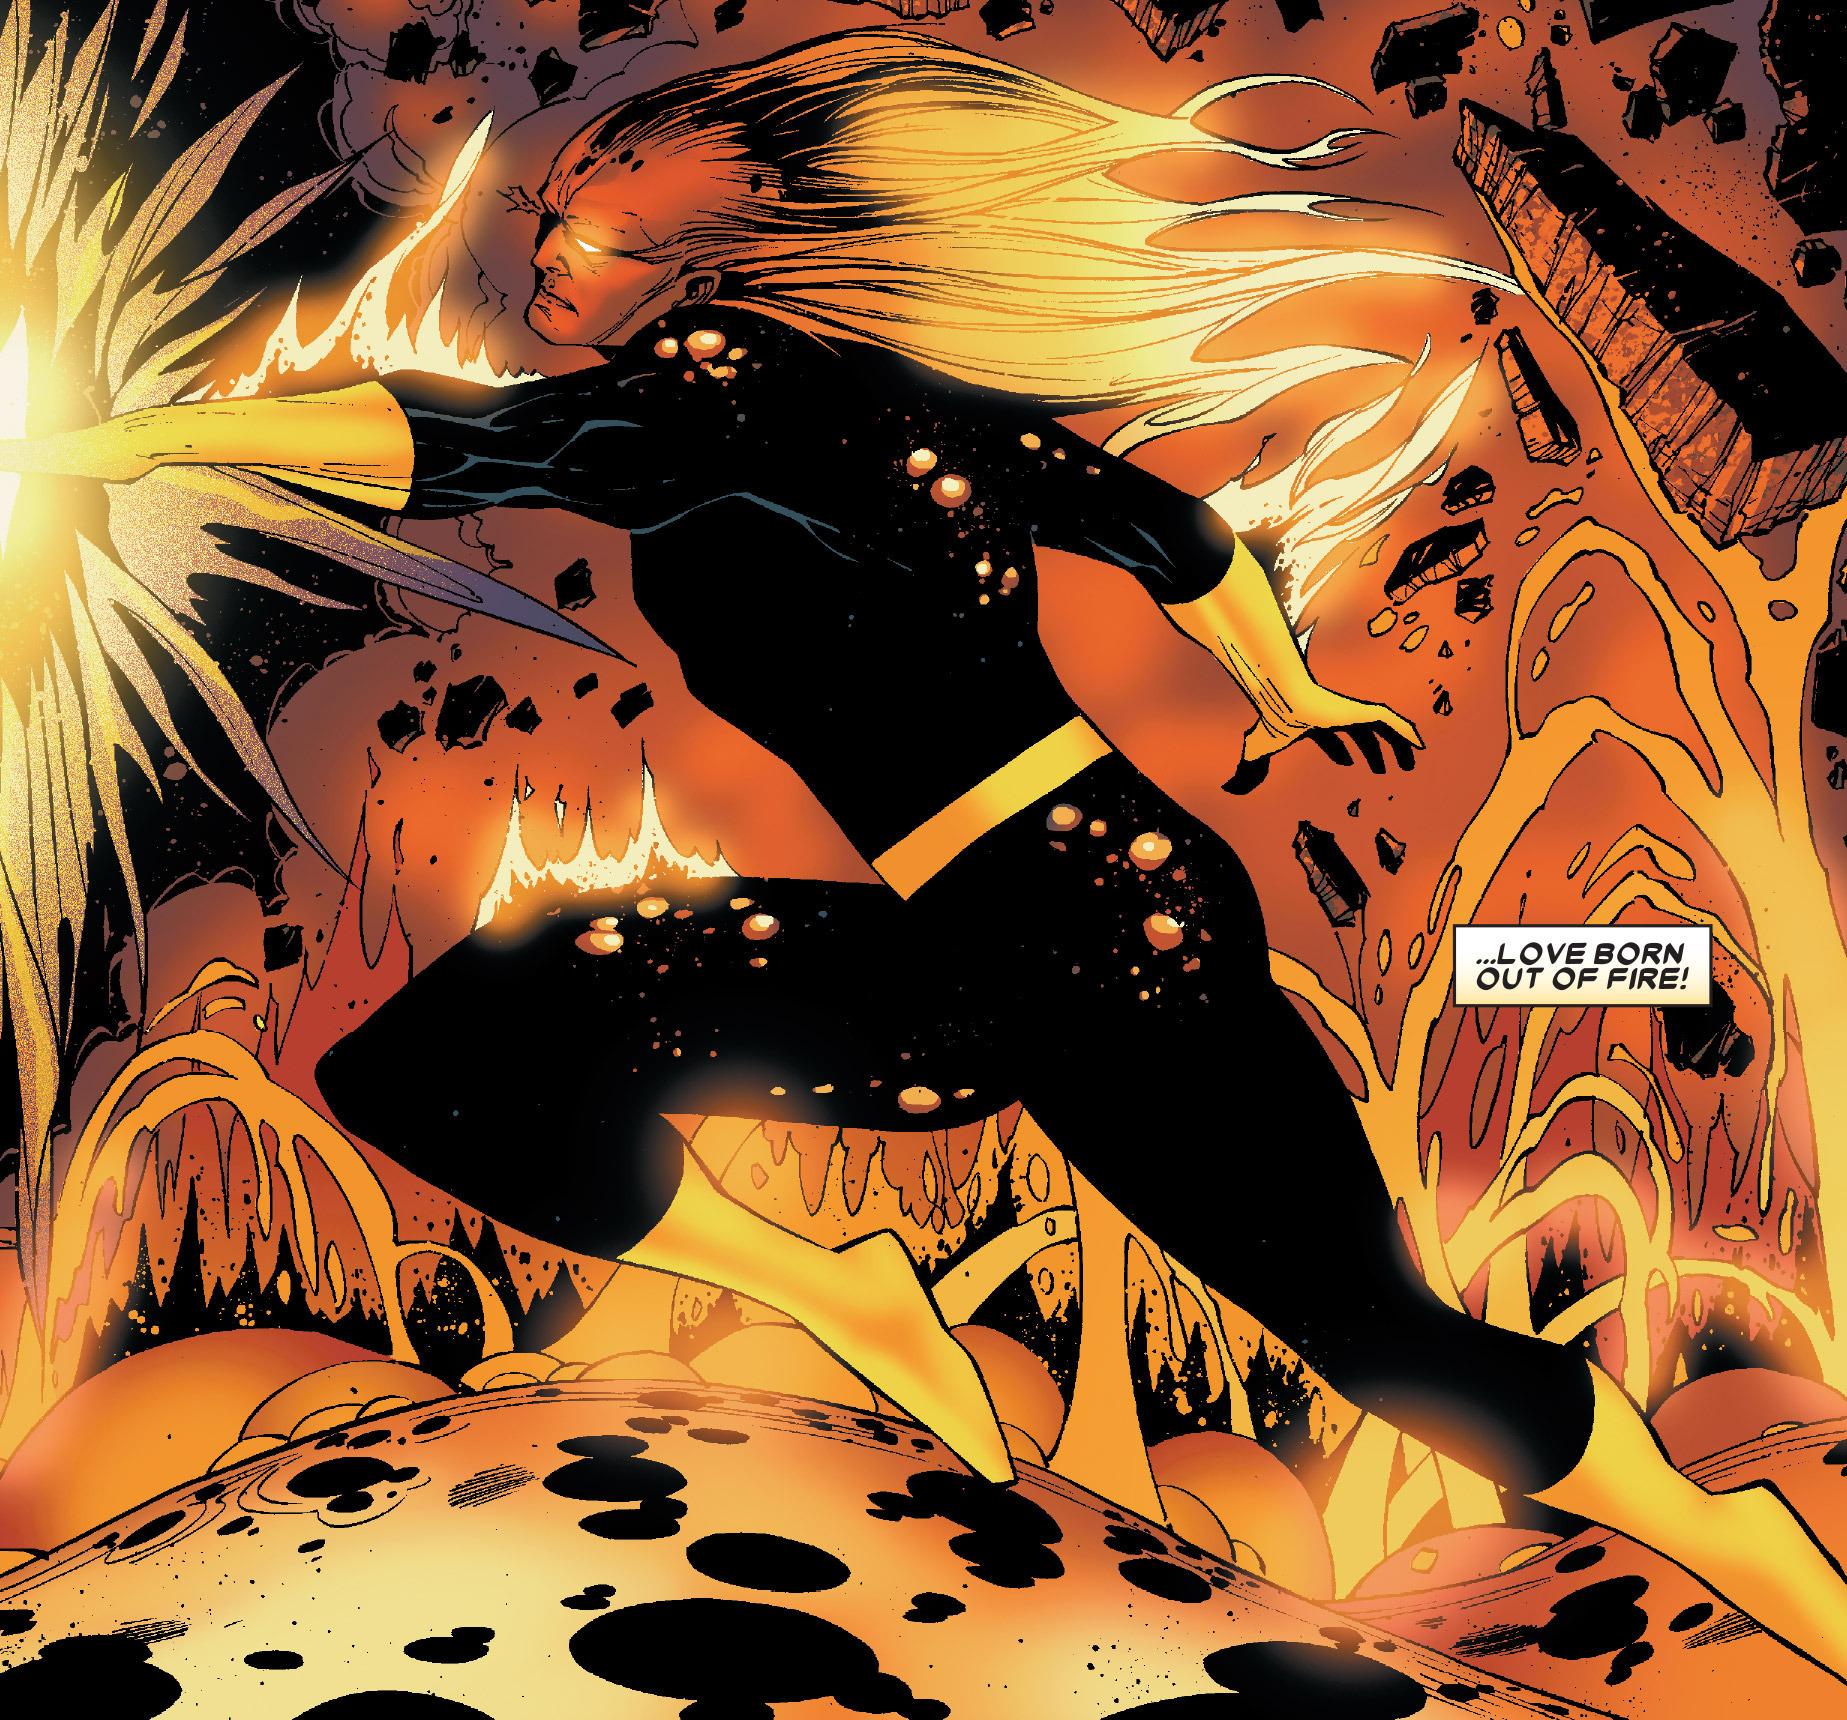 Antonio (Mutant) (Earth-616)